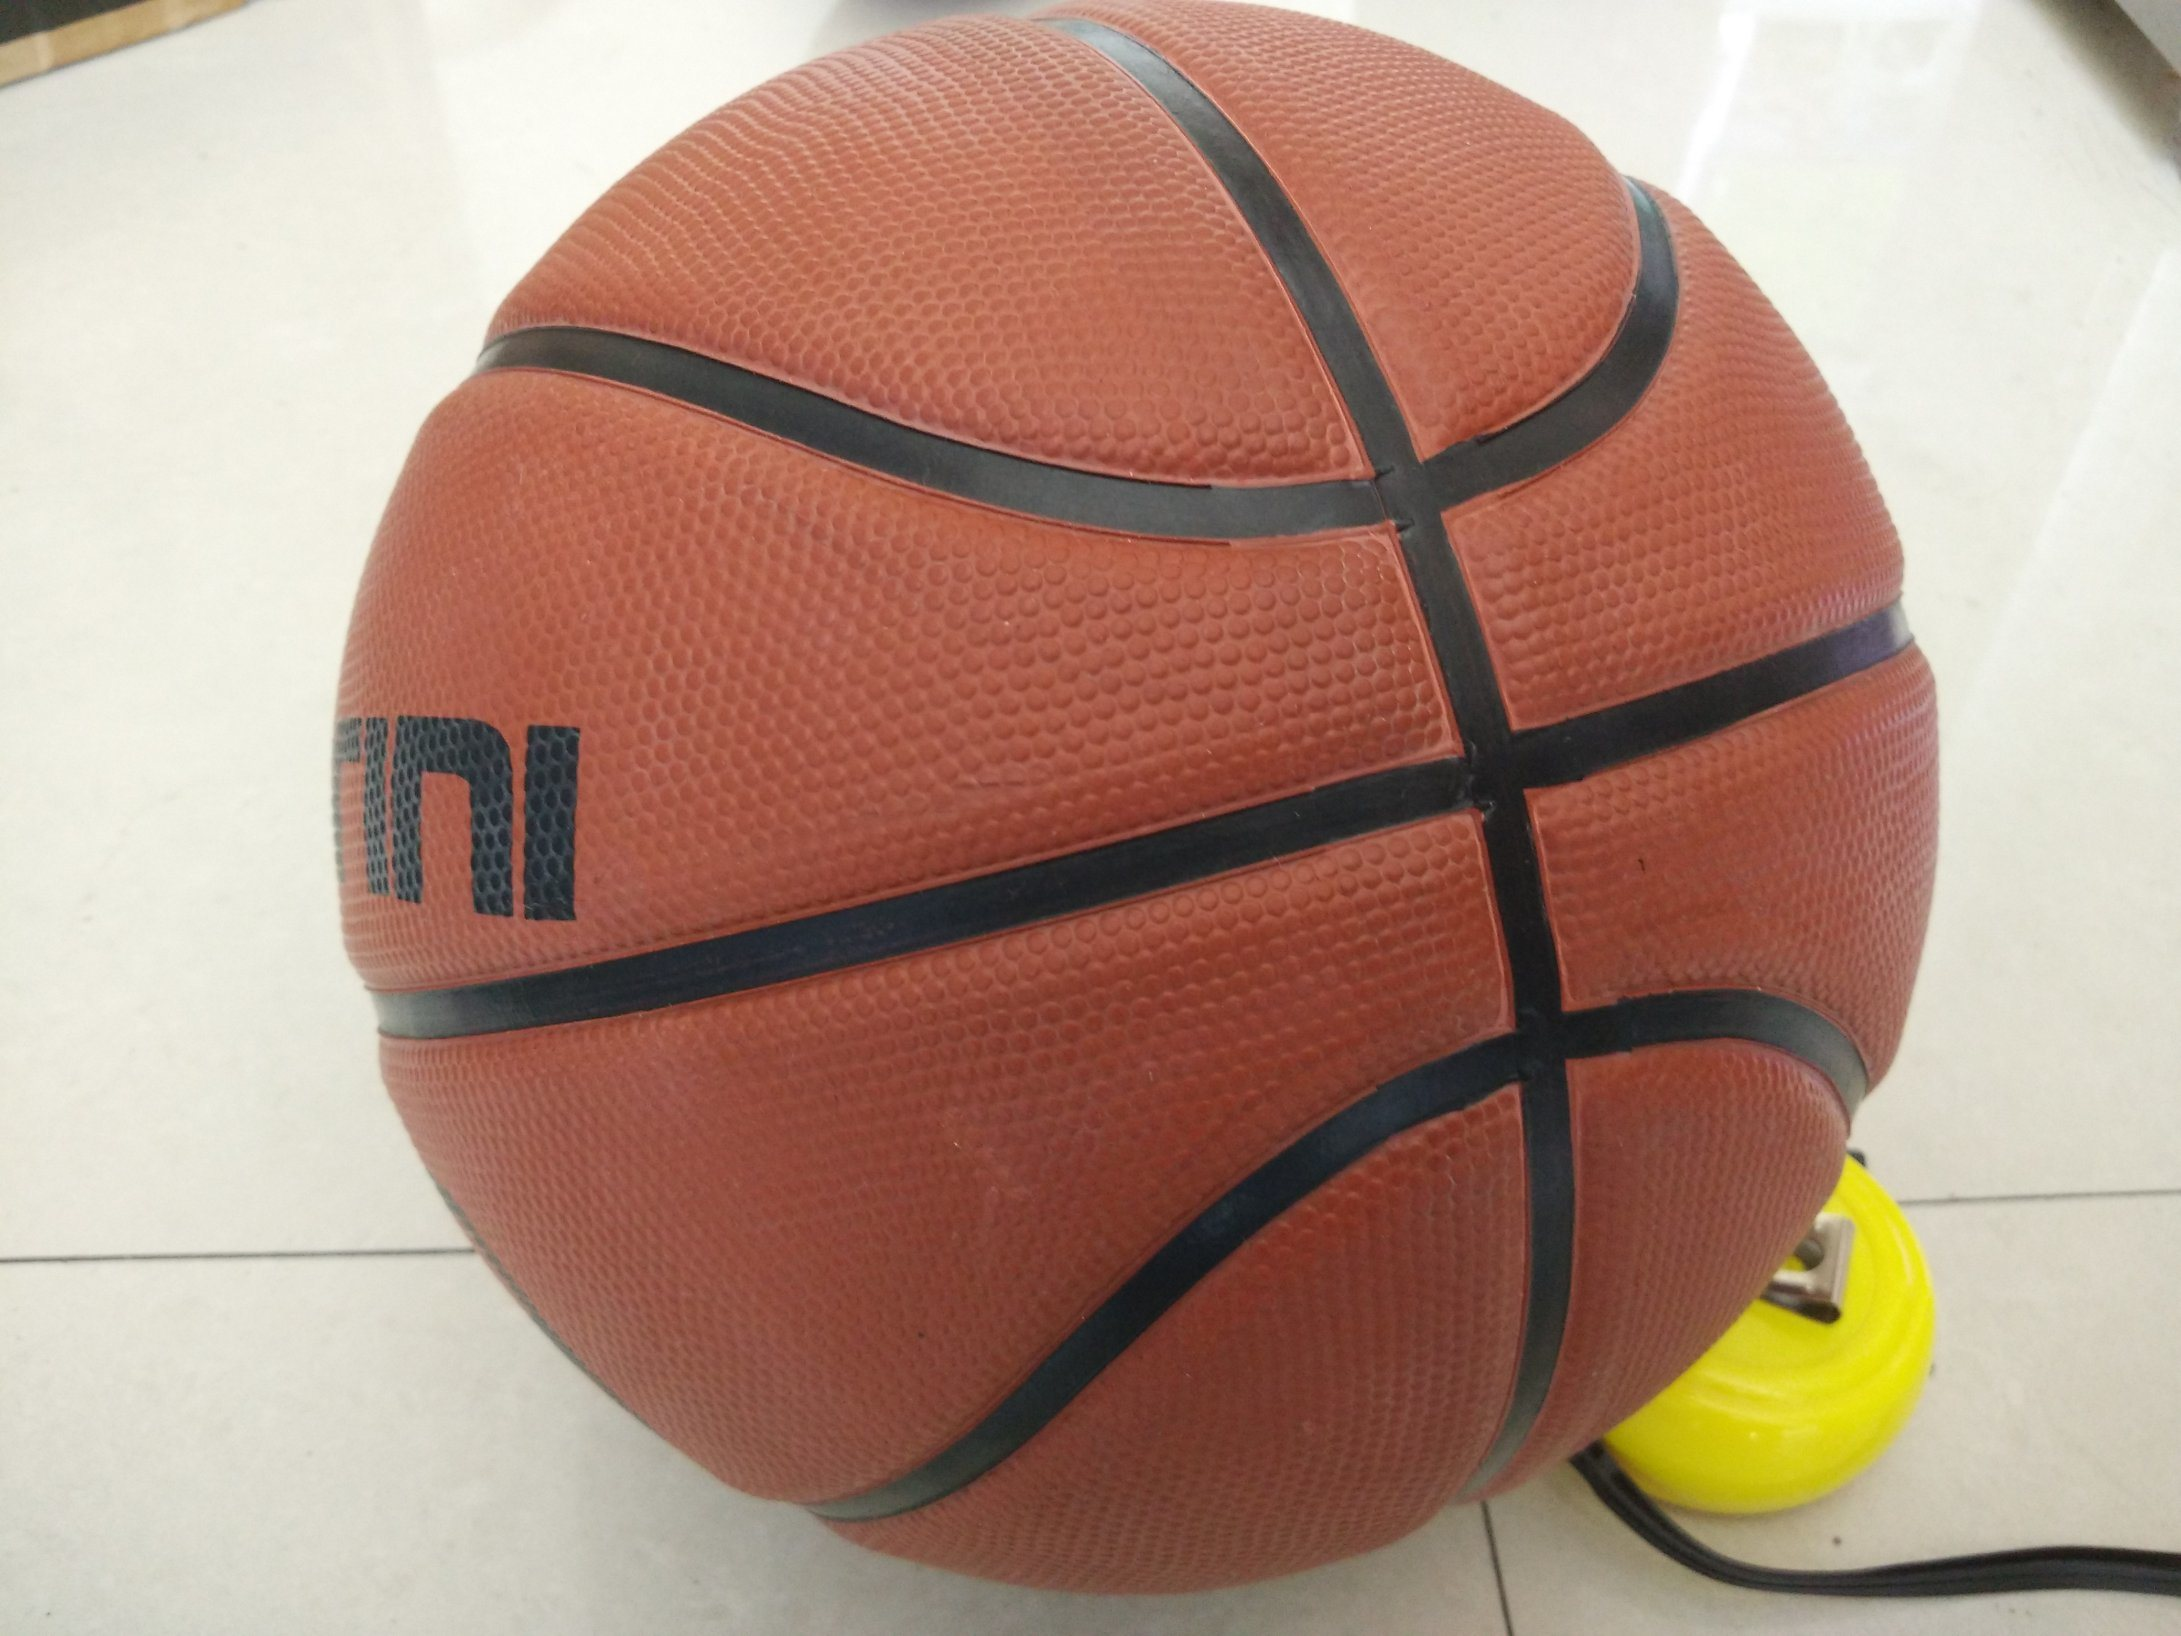 5# Rubber Foam Outdoor Sport Basketball